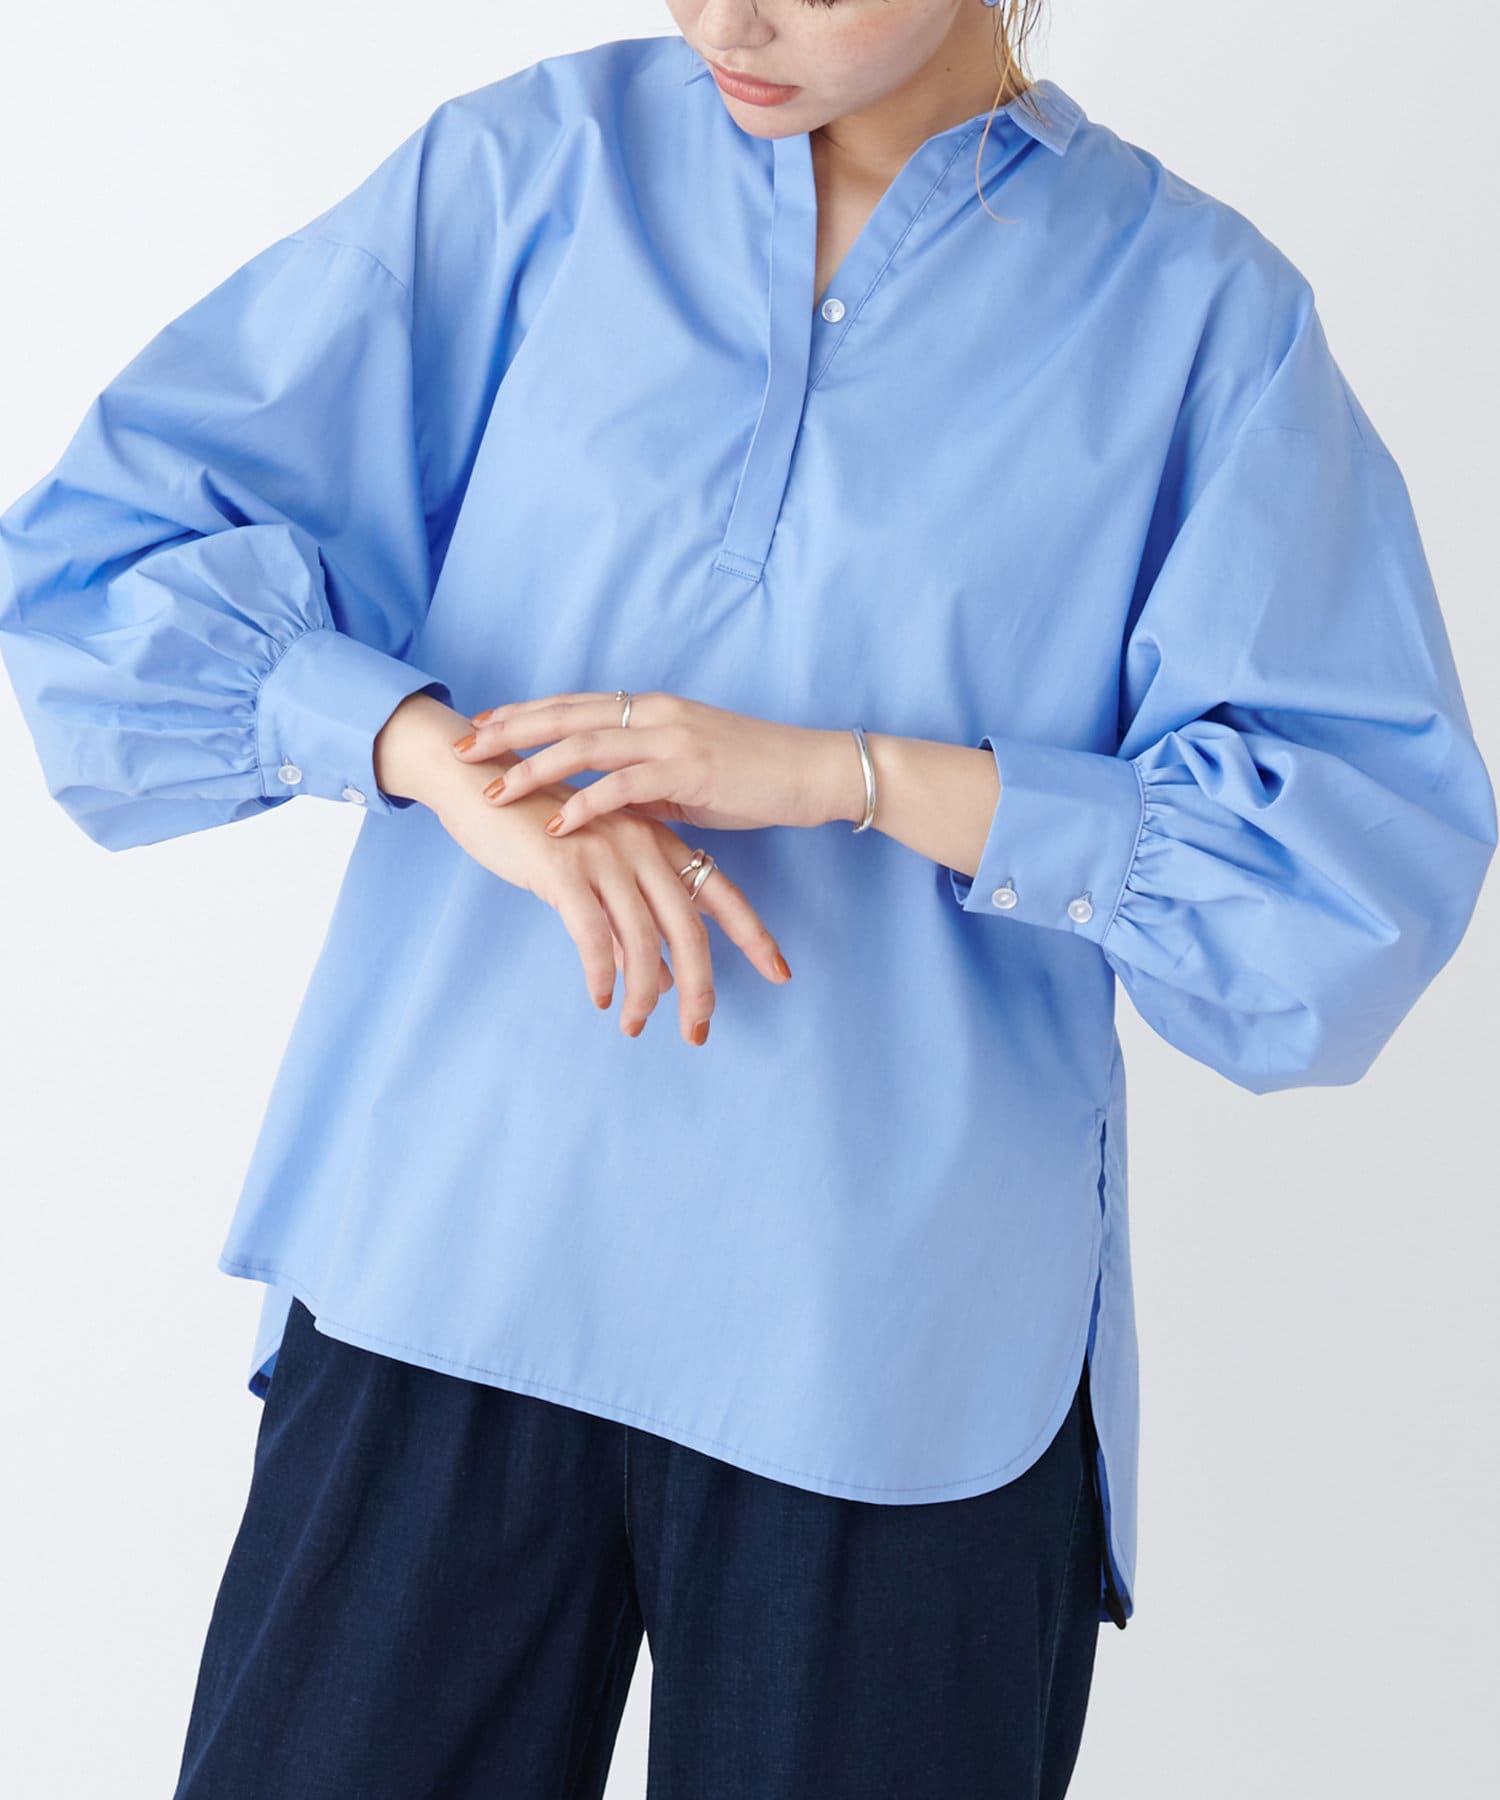 COLLAGE GALLARDAGALANTE(コラージュ ガリャルダガランテ) レディース ボリューム袖スキッパーシャツ ブルー